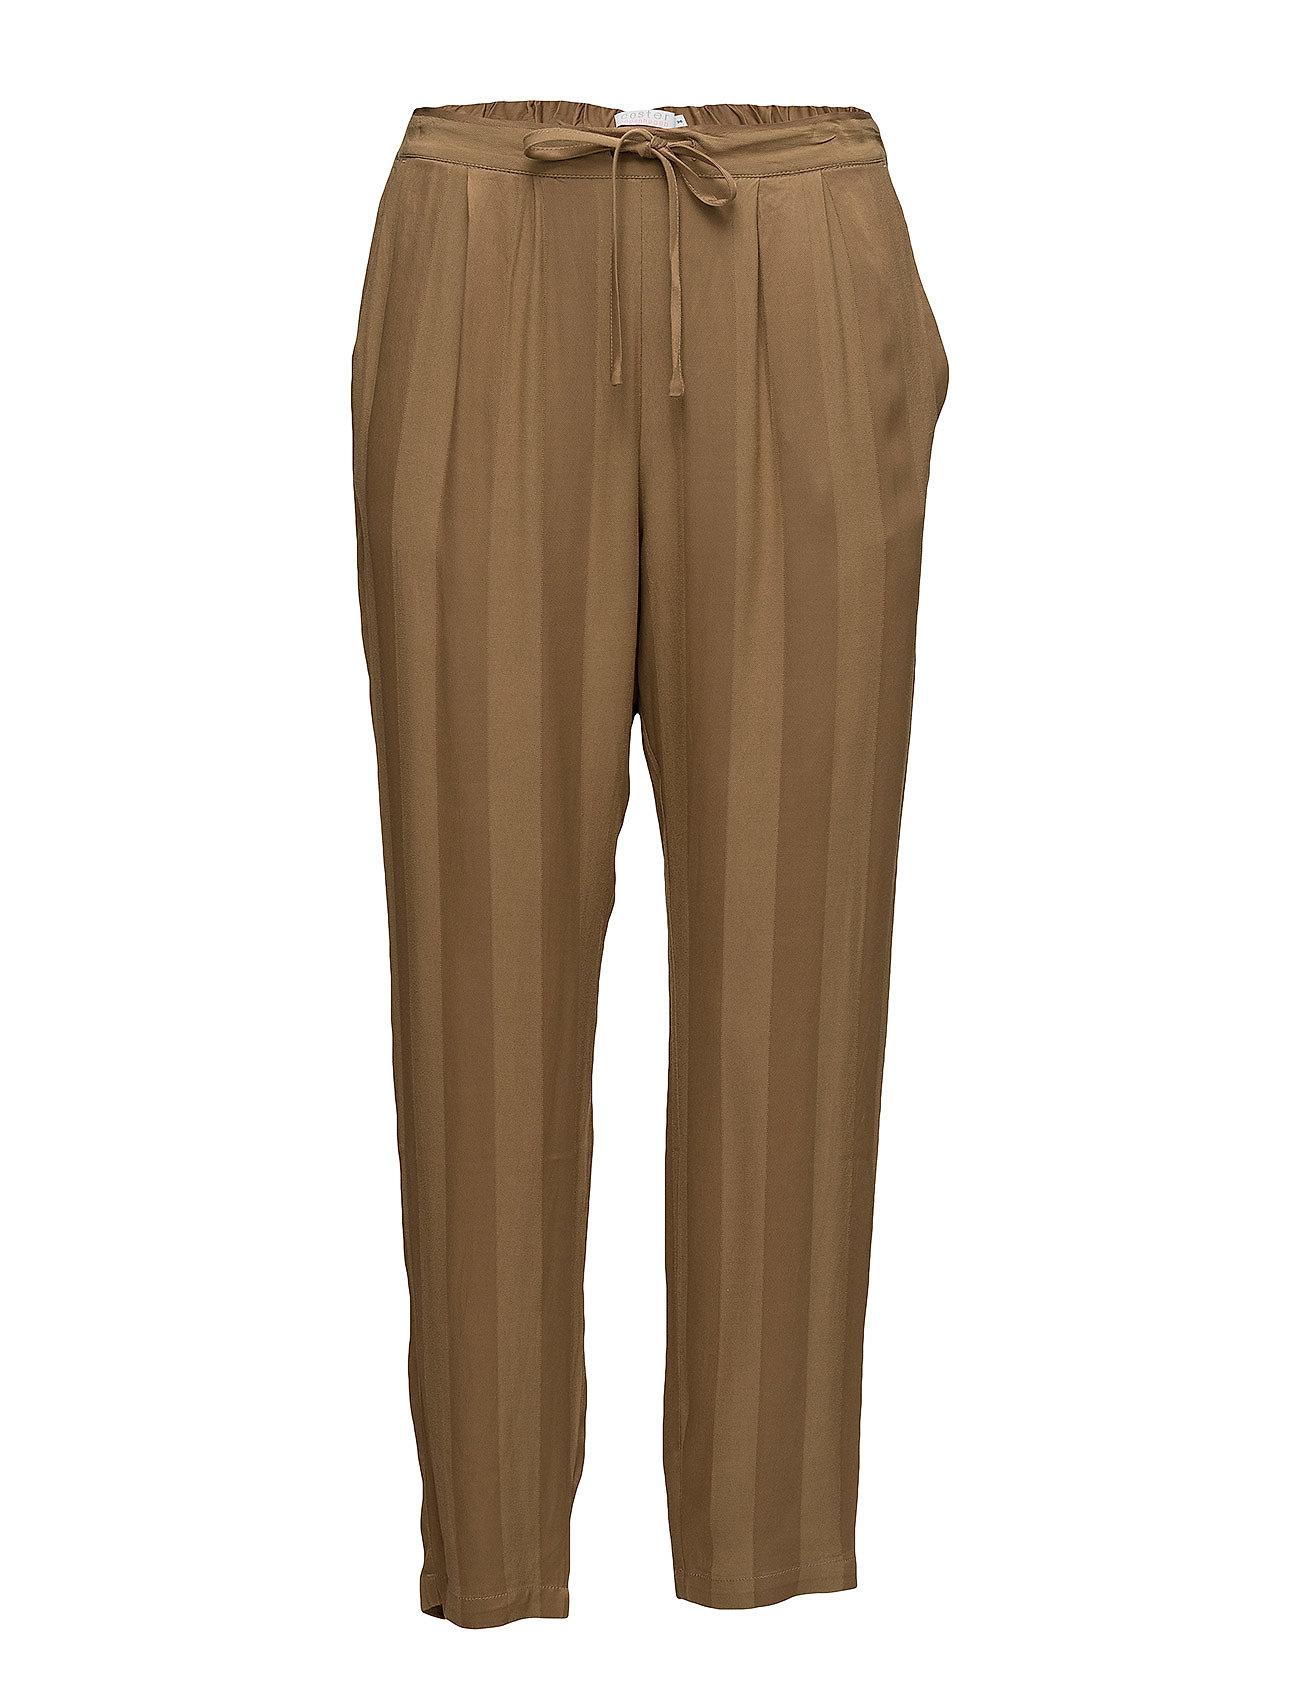 Striped Jacquard Trousers - Coster Copenhagen